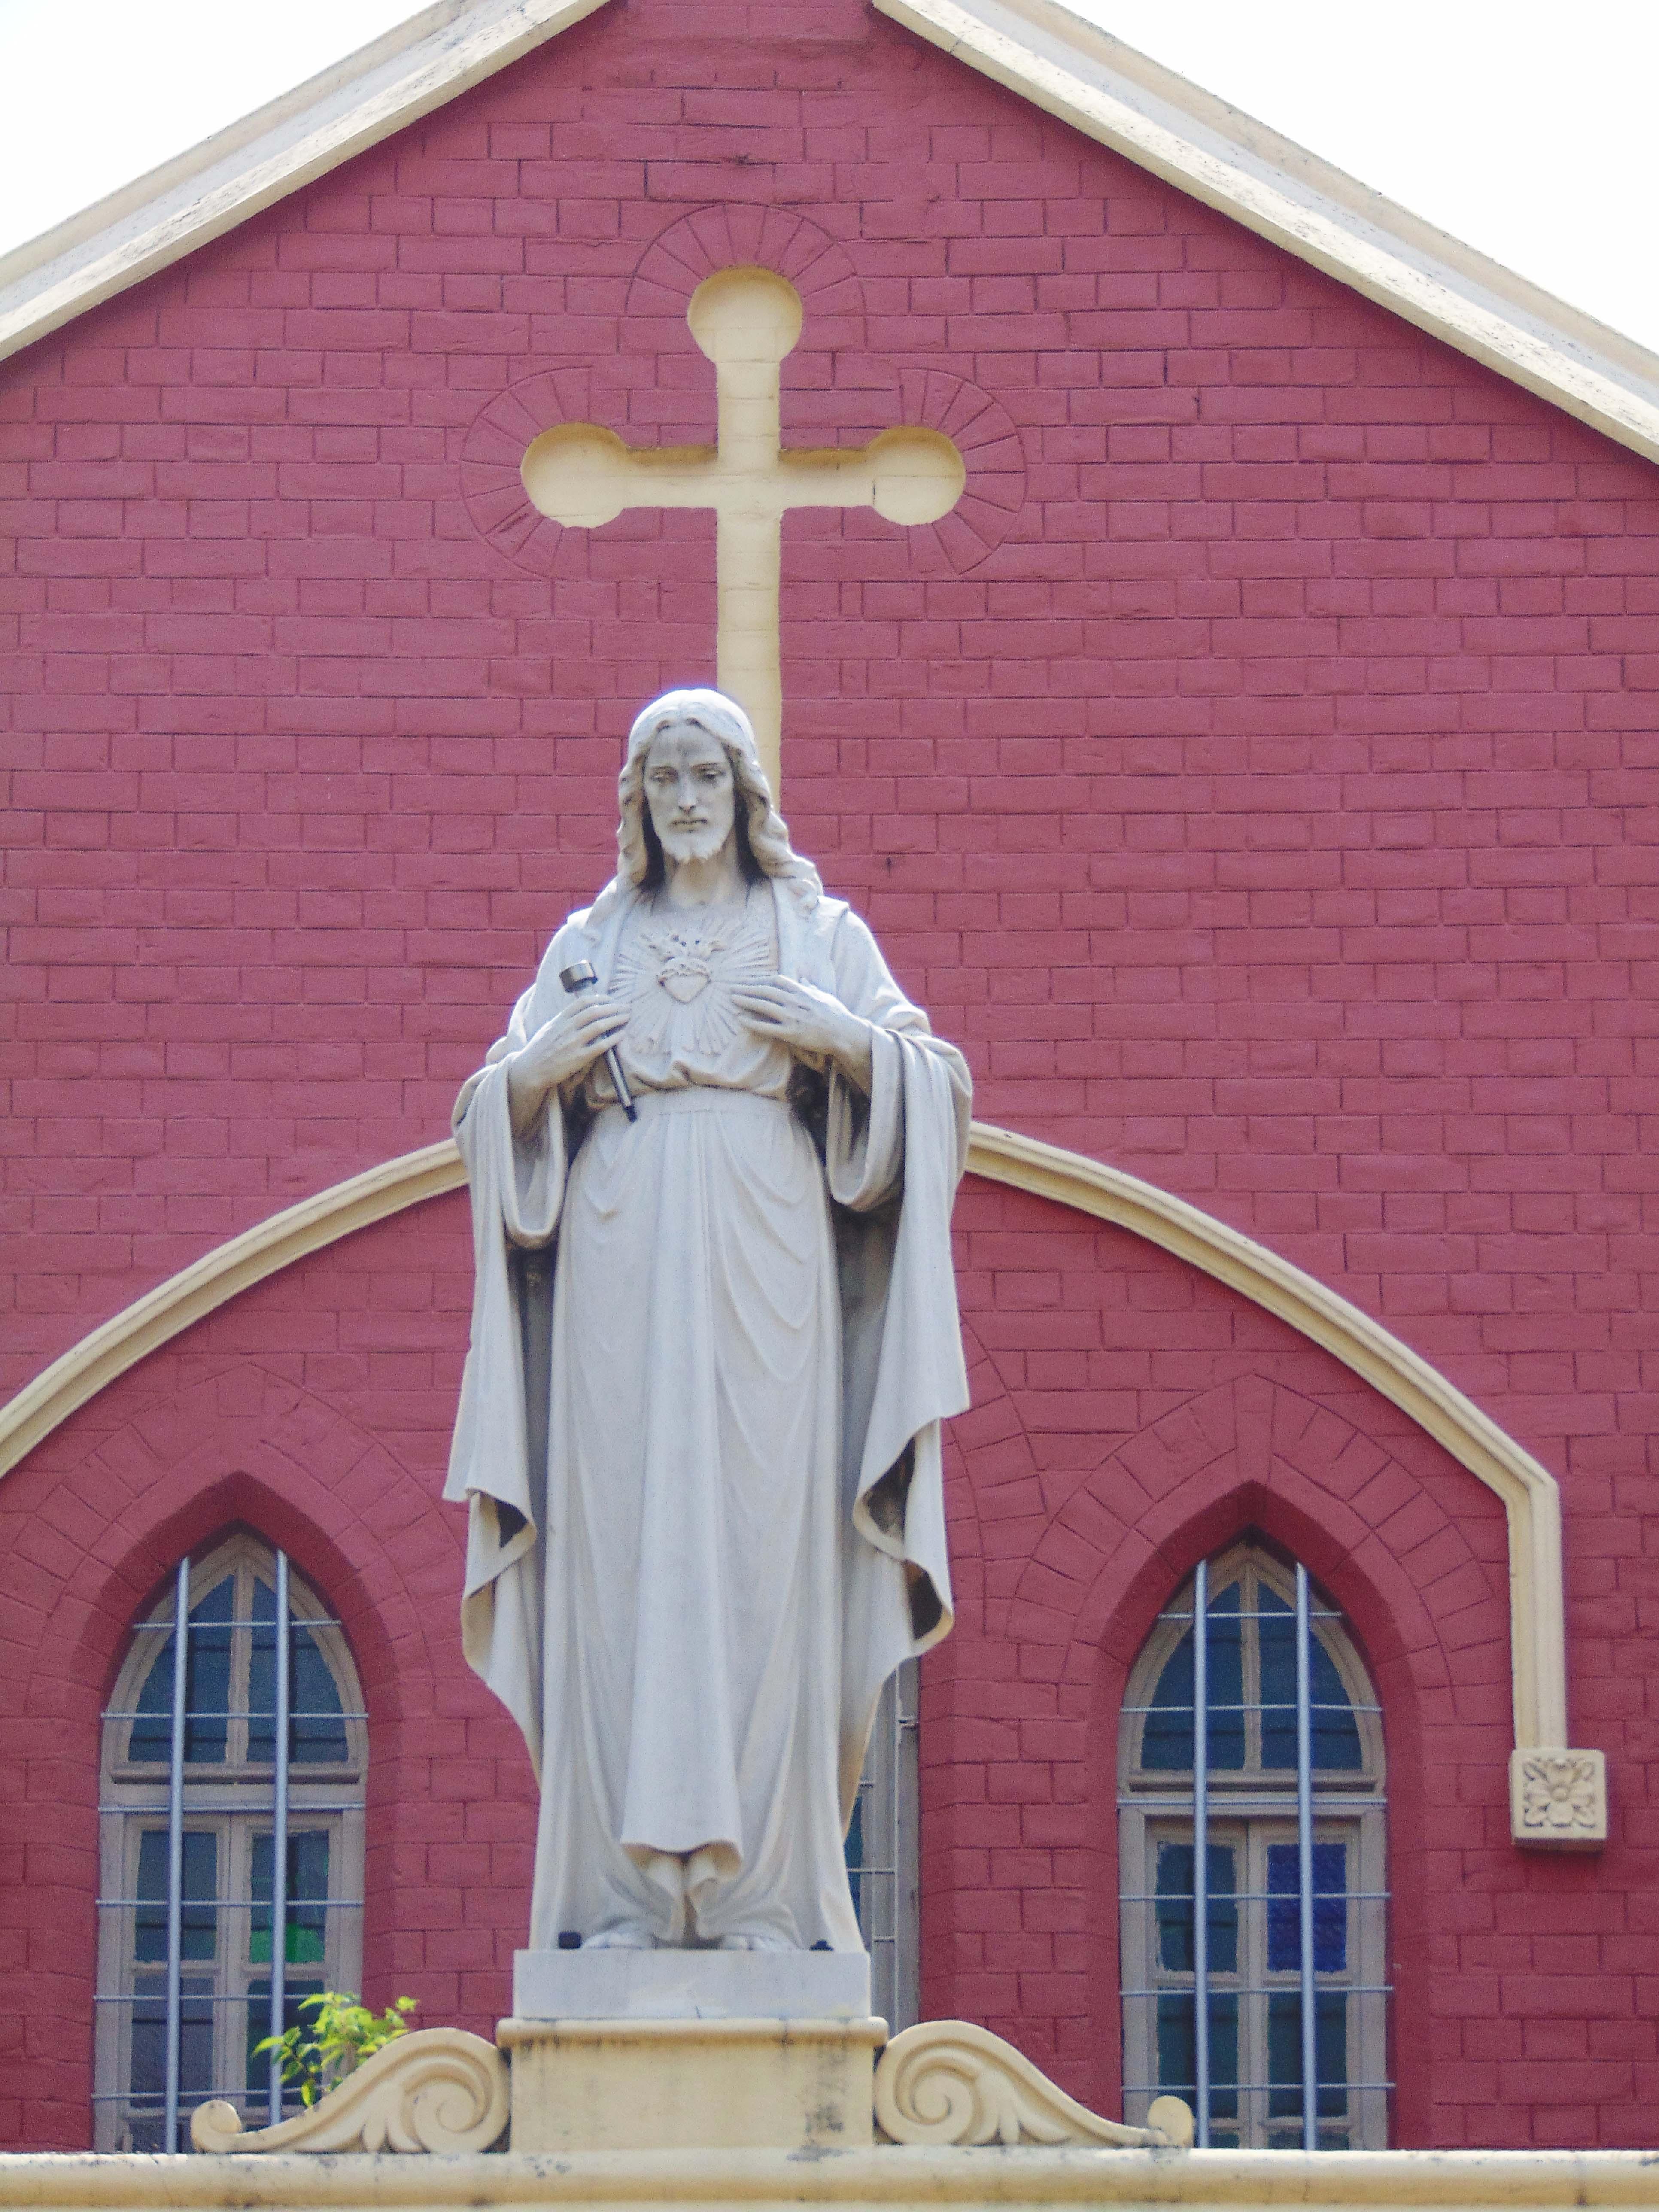 File:Statue of Jesus Christ at Sacred Heart Church, Asansol.jpg ...